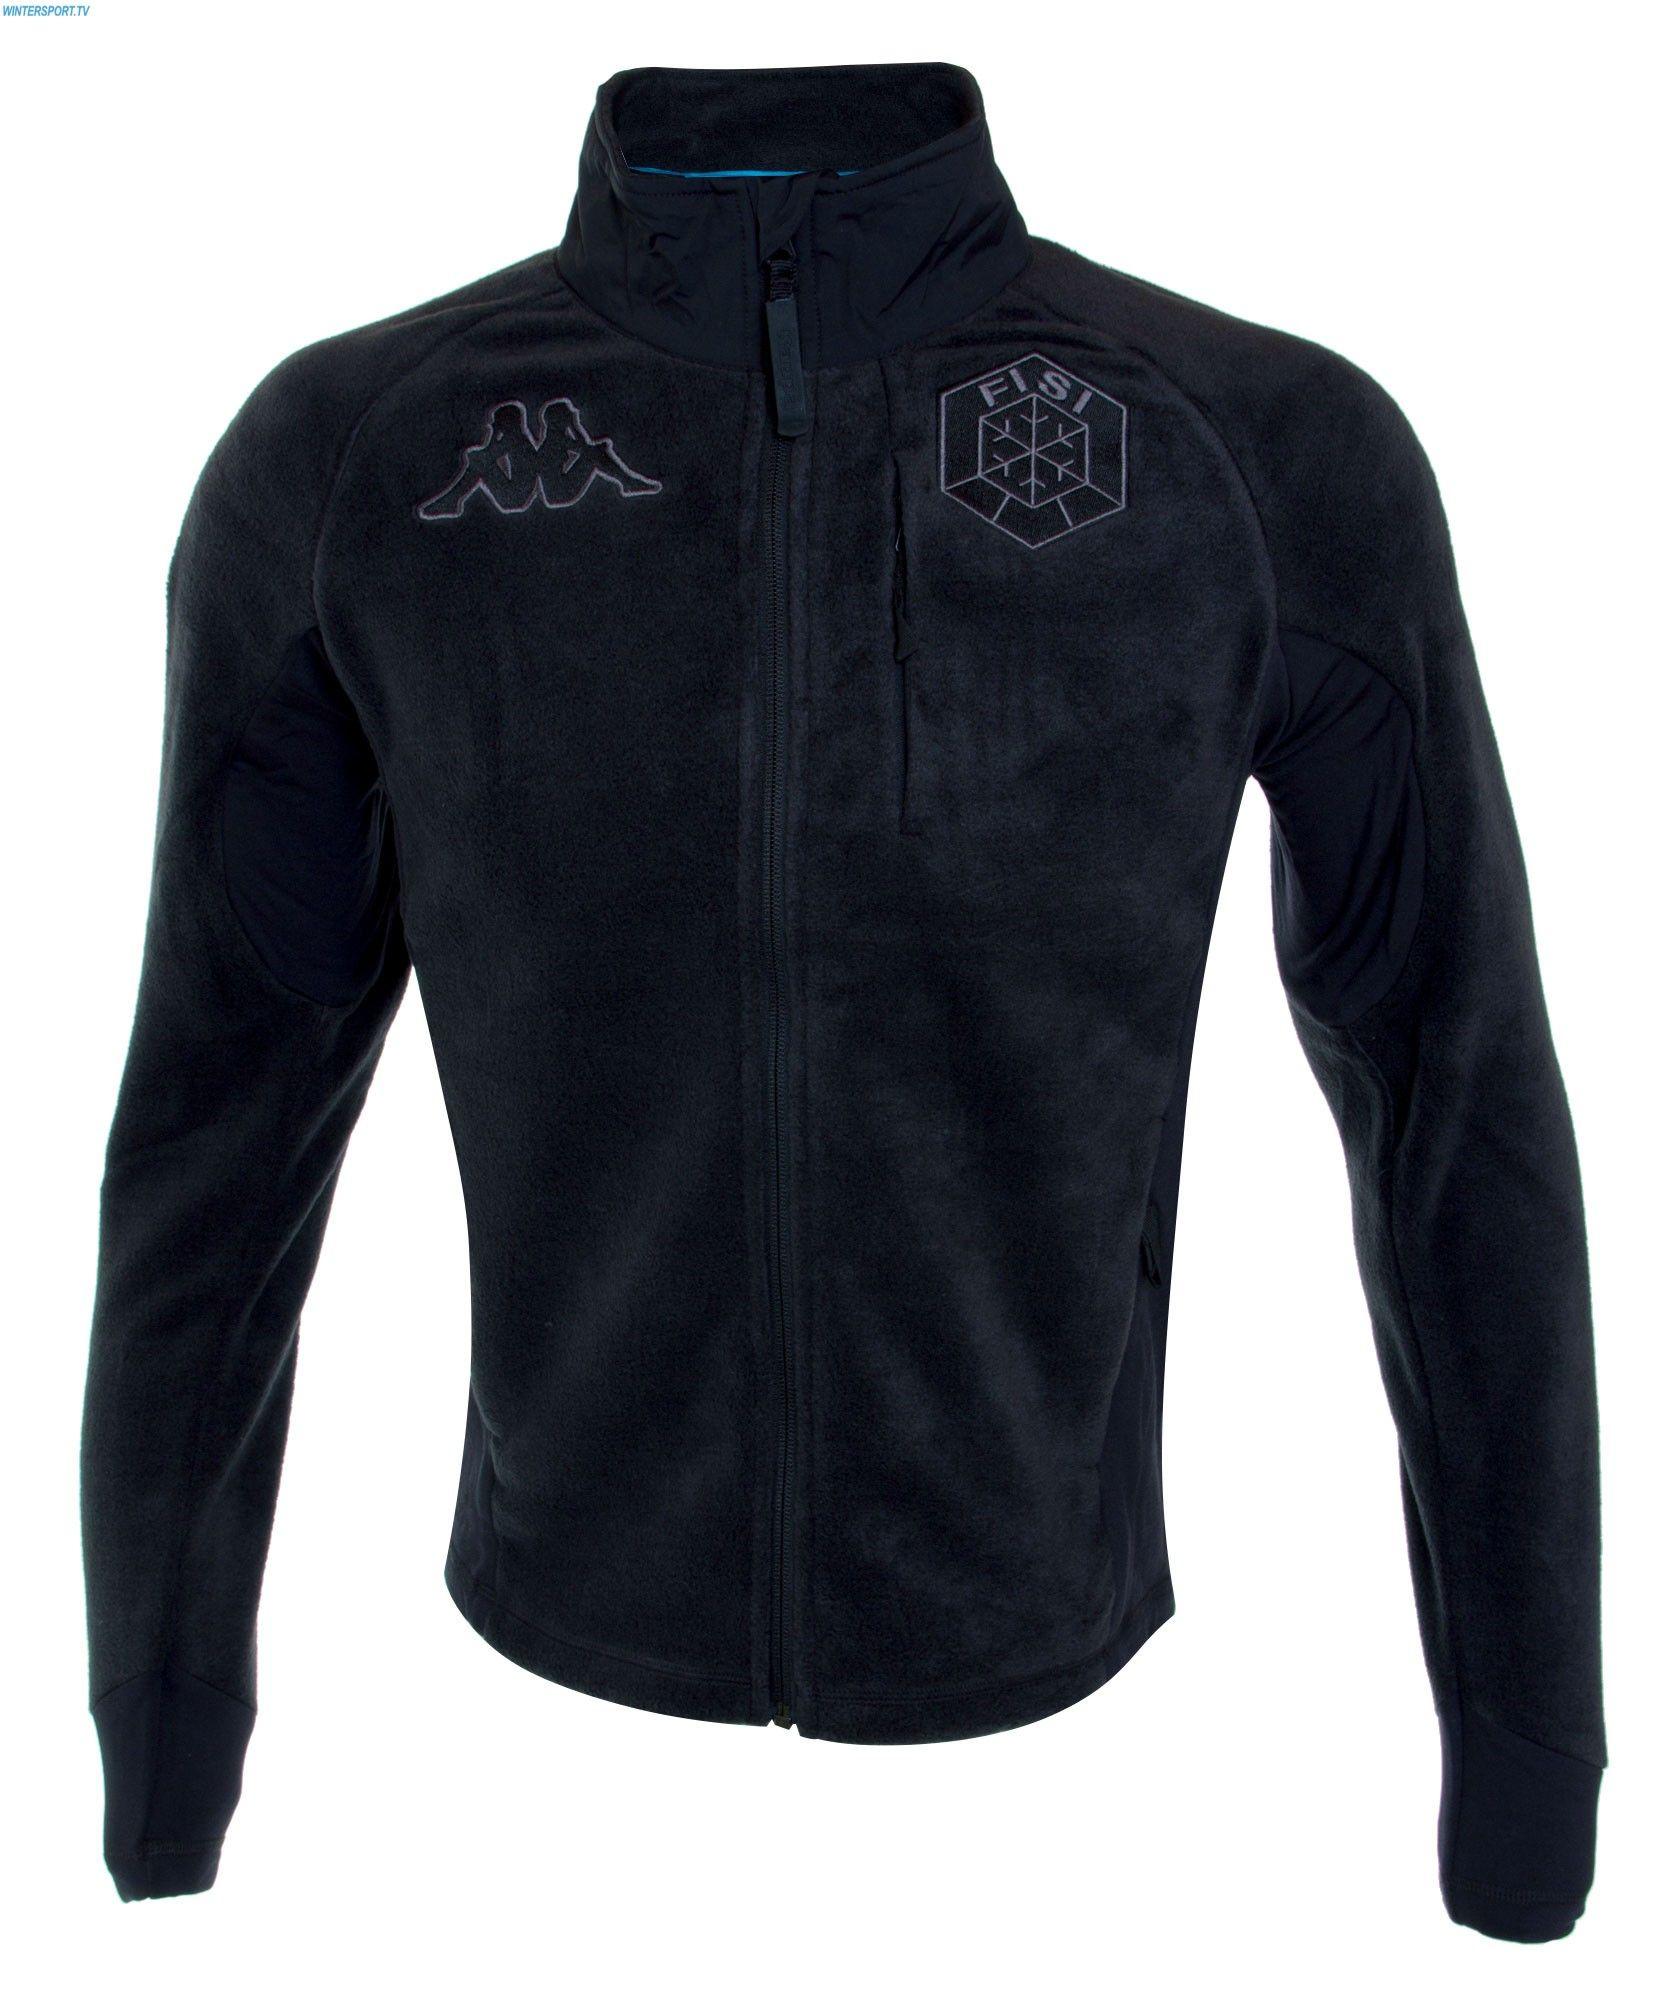 Kappa Men Italian Team FISI Fleece Jacket - Black (Limited Edition ... 266eb165de5